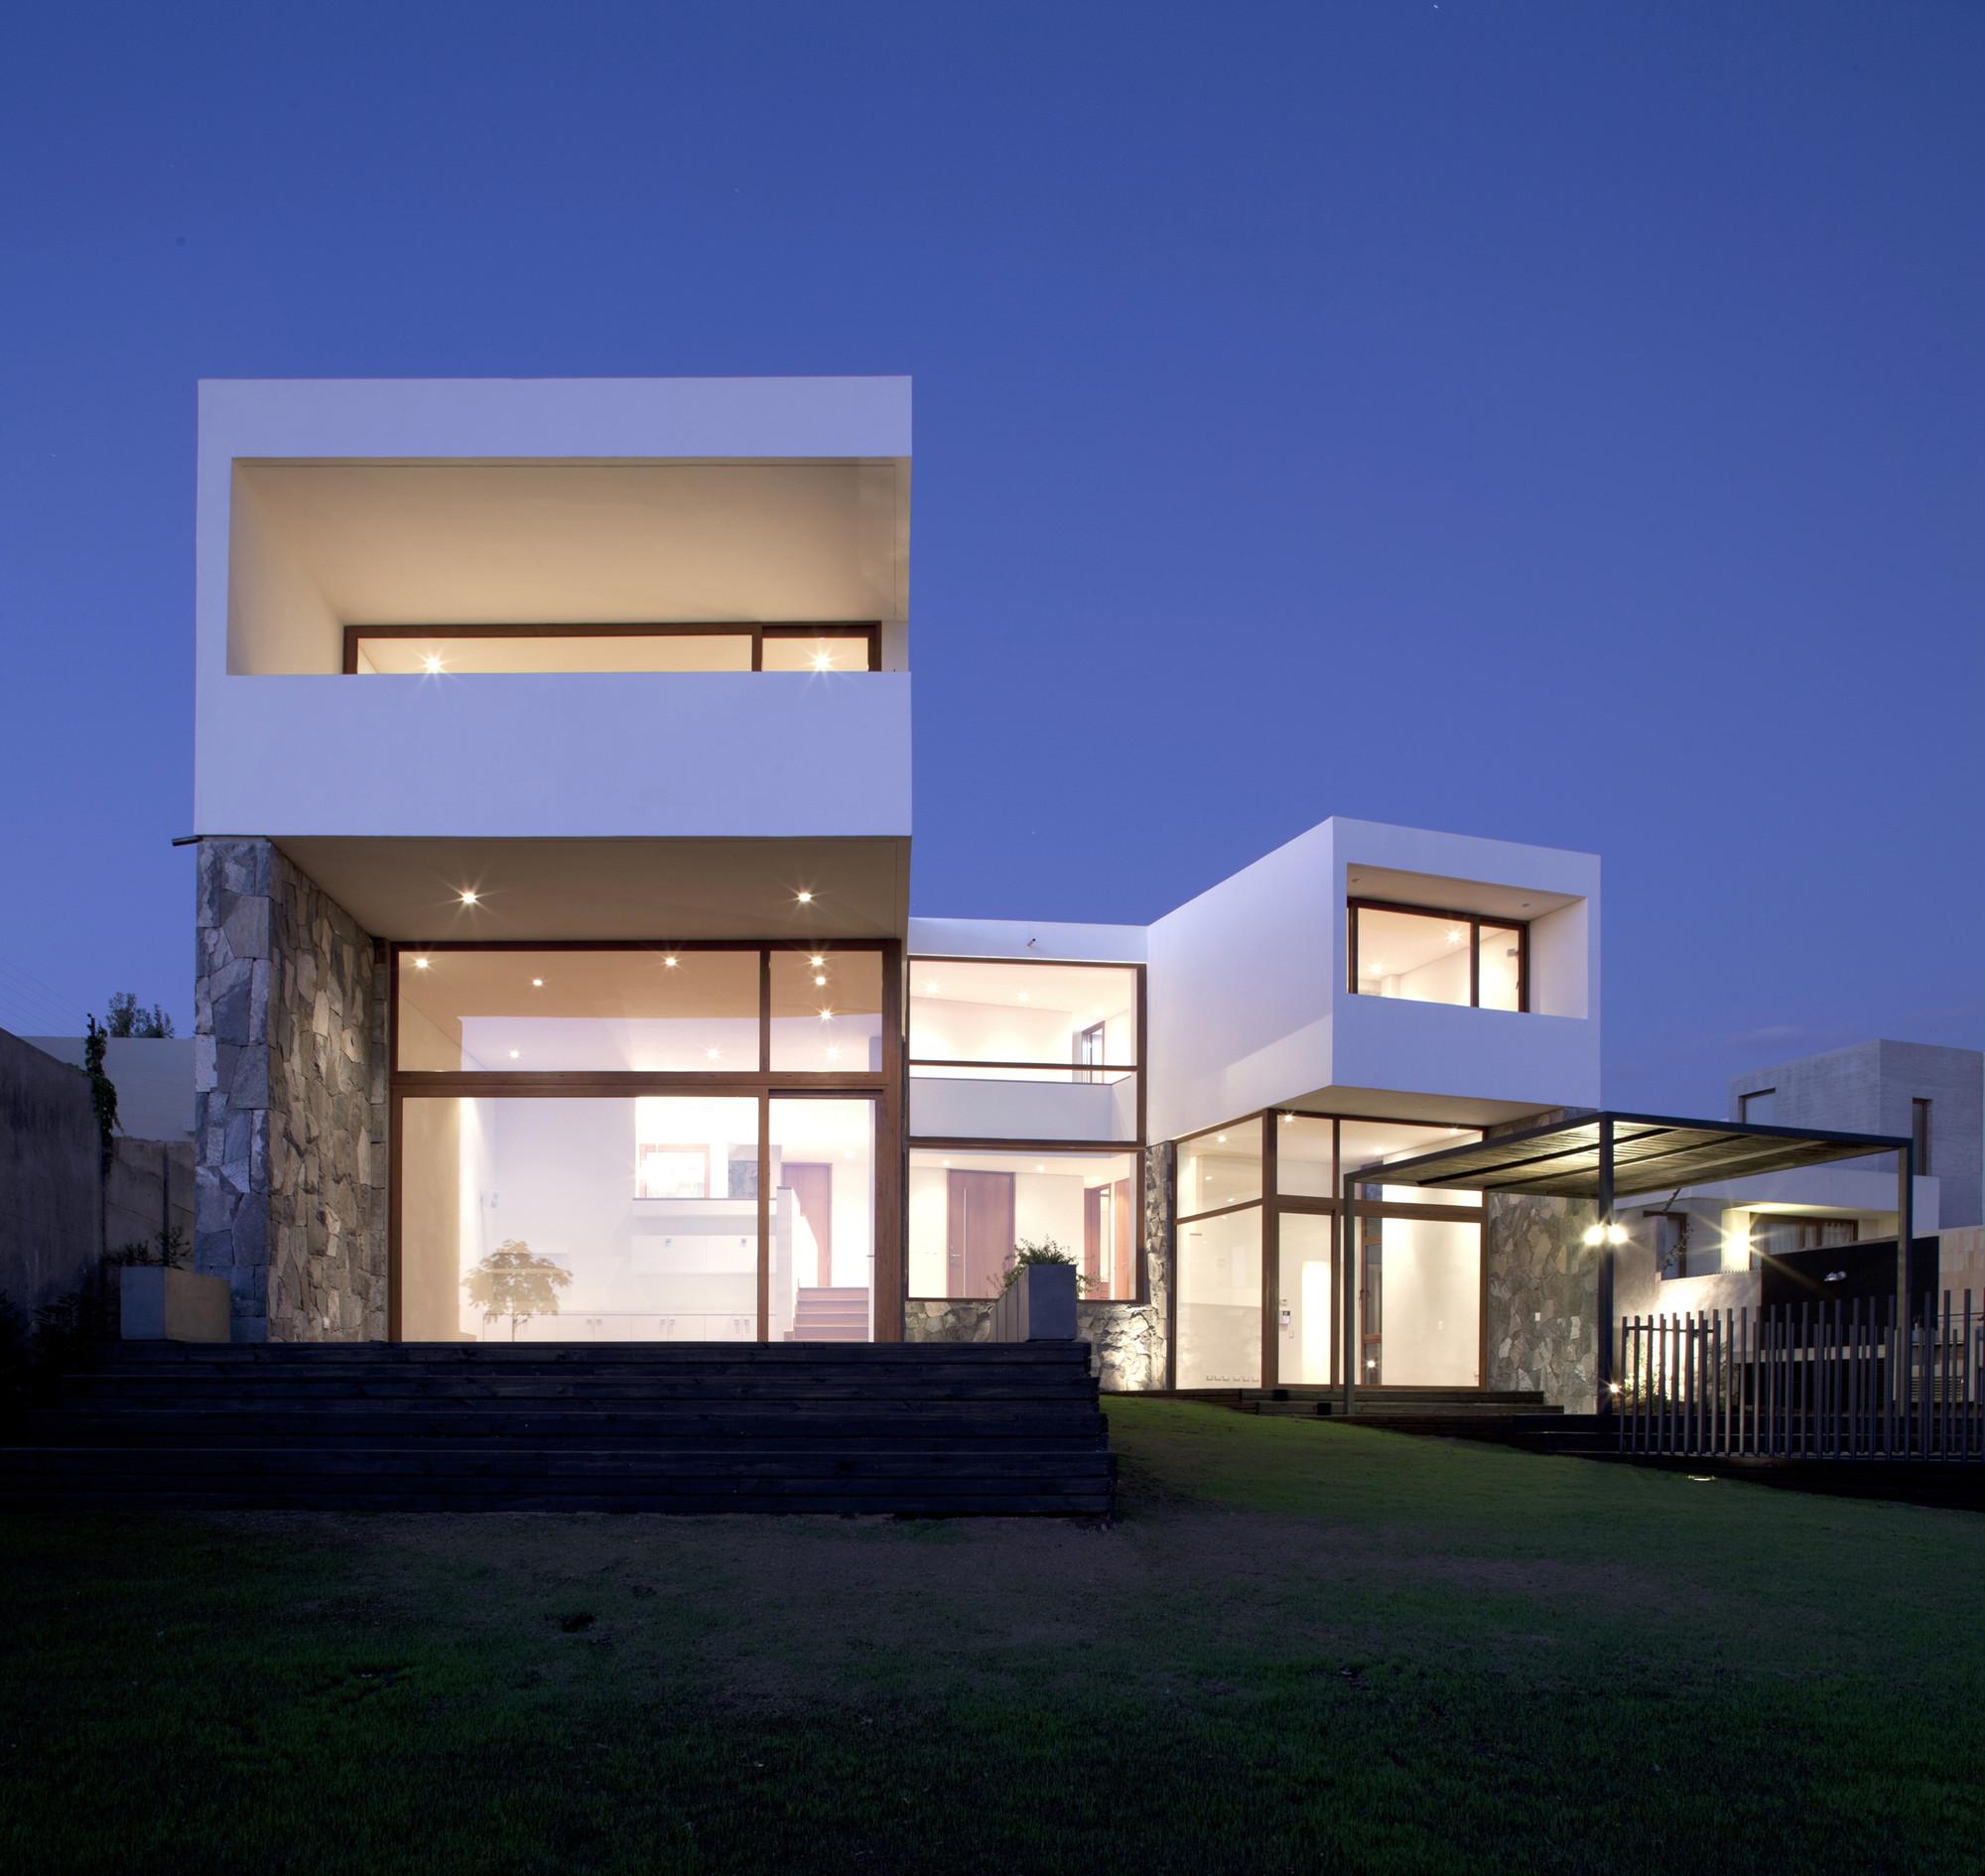 Modern Exterior Of Home With Pathway Transom Window: Smith / EMa Arquitectos + Raimundo Salgado